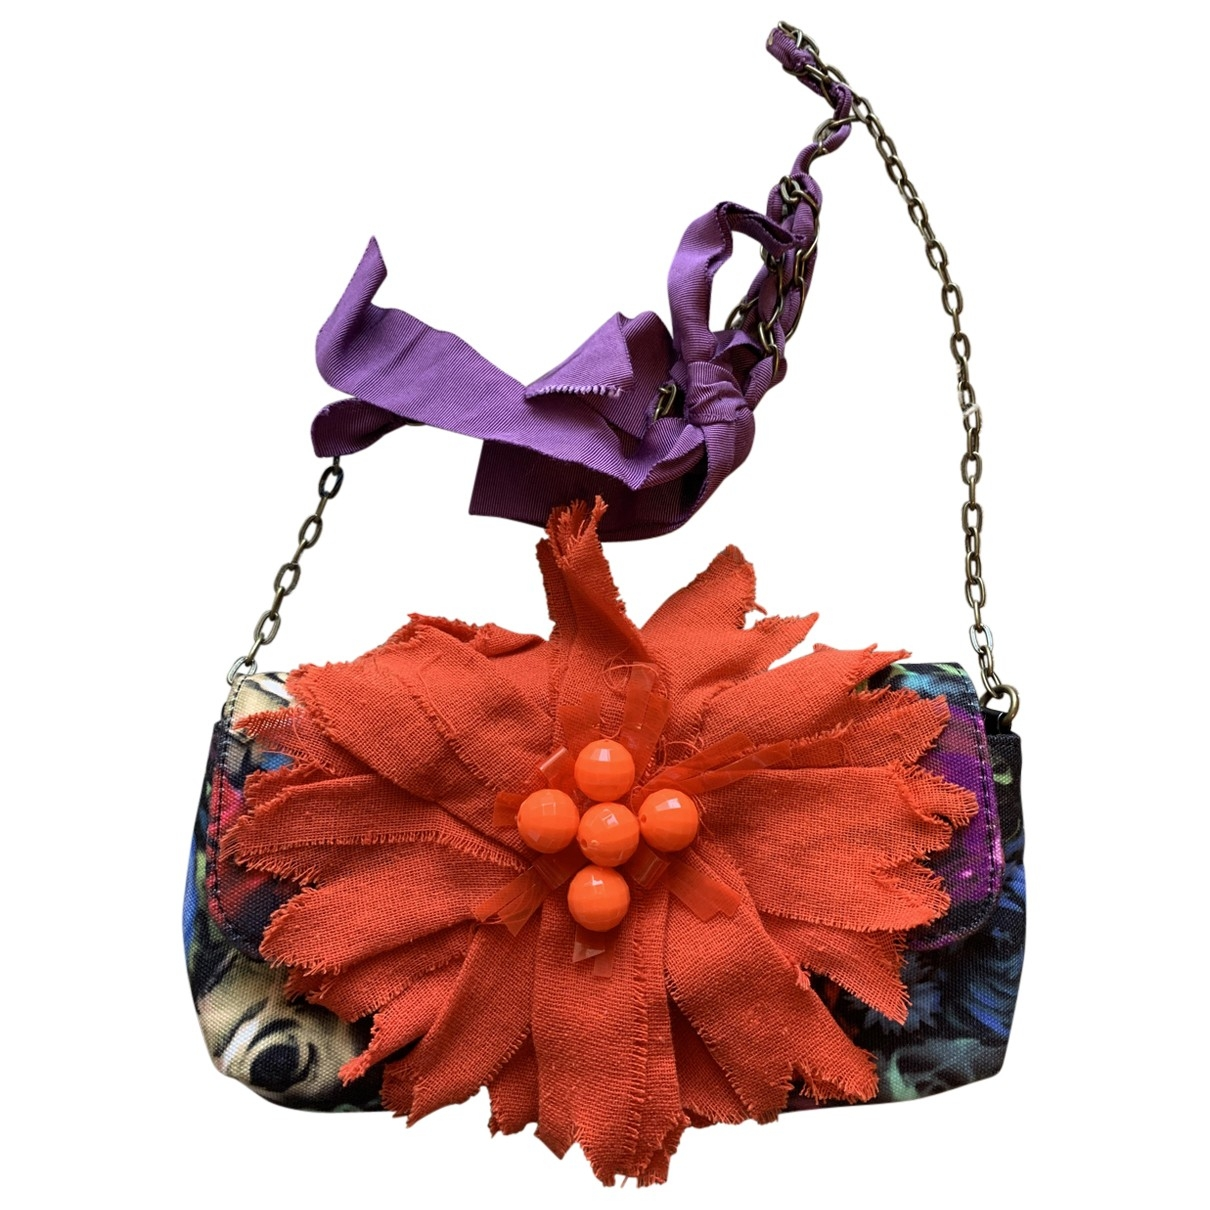 Lanvin For H&m \N Multicolour Cloth Purses, wallet & cases for Women \N